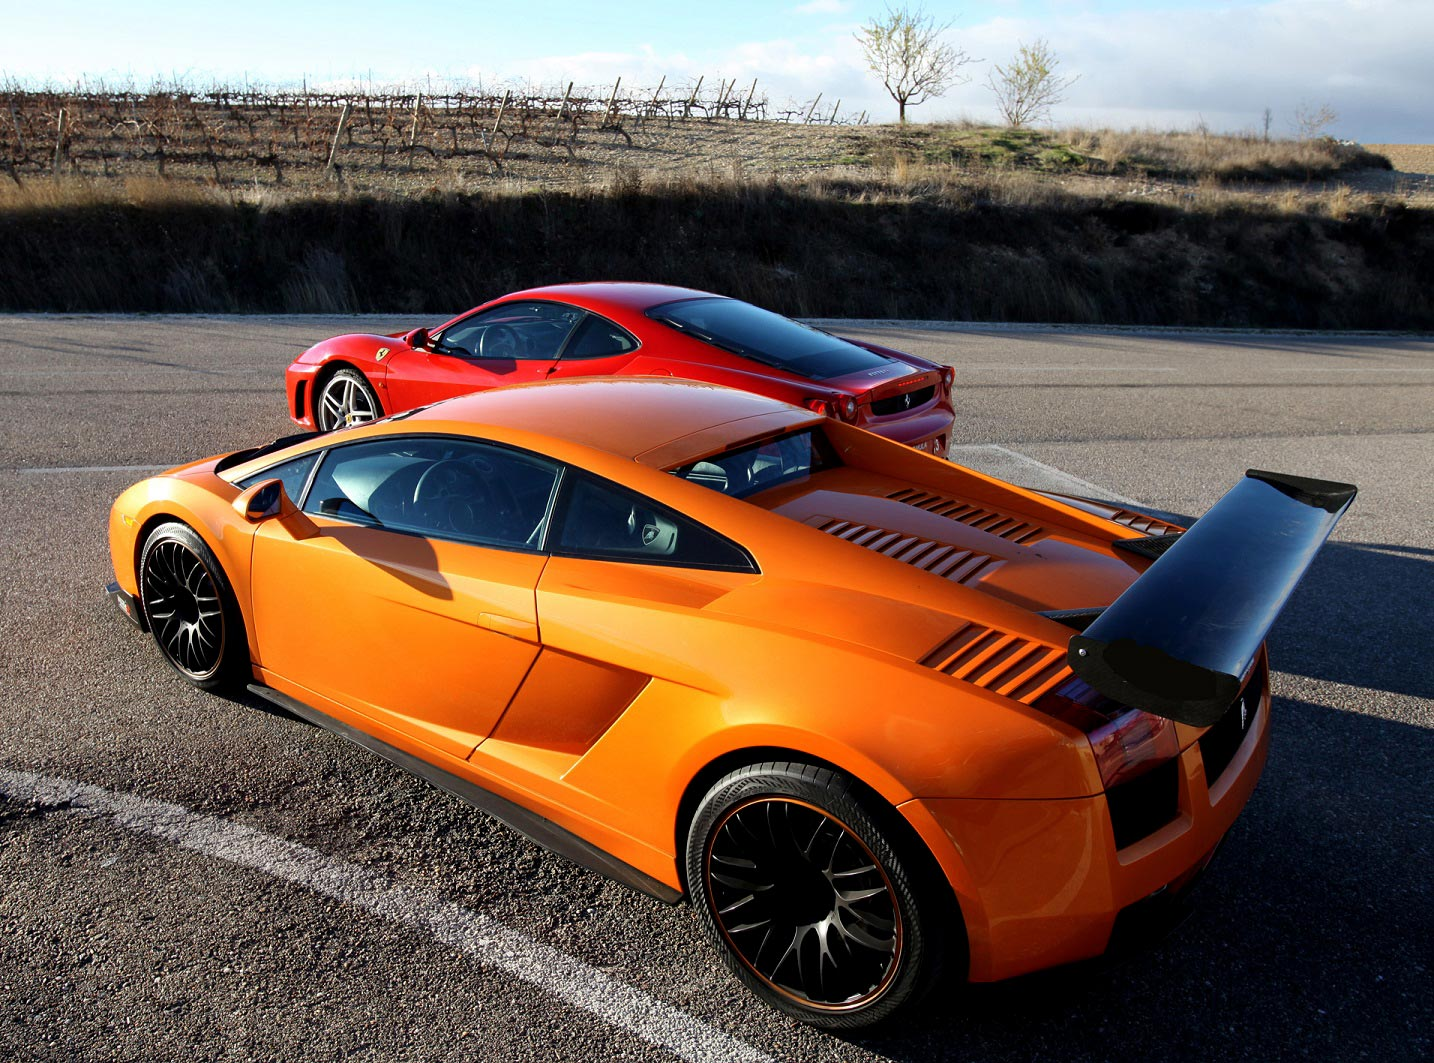 Ferrari F430 Y Lamborghini Gallardo 3 3 Vueltas Gtpasion Com